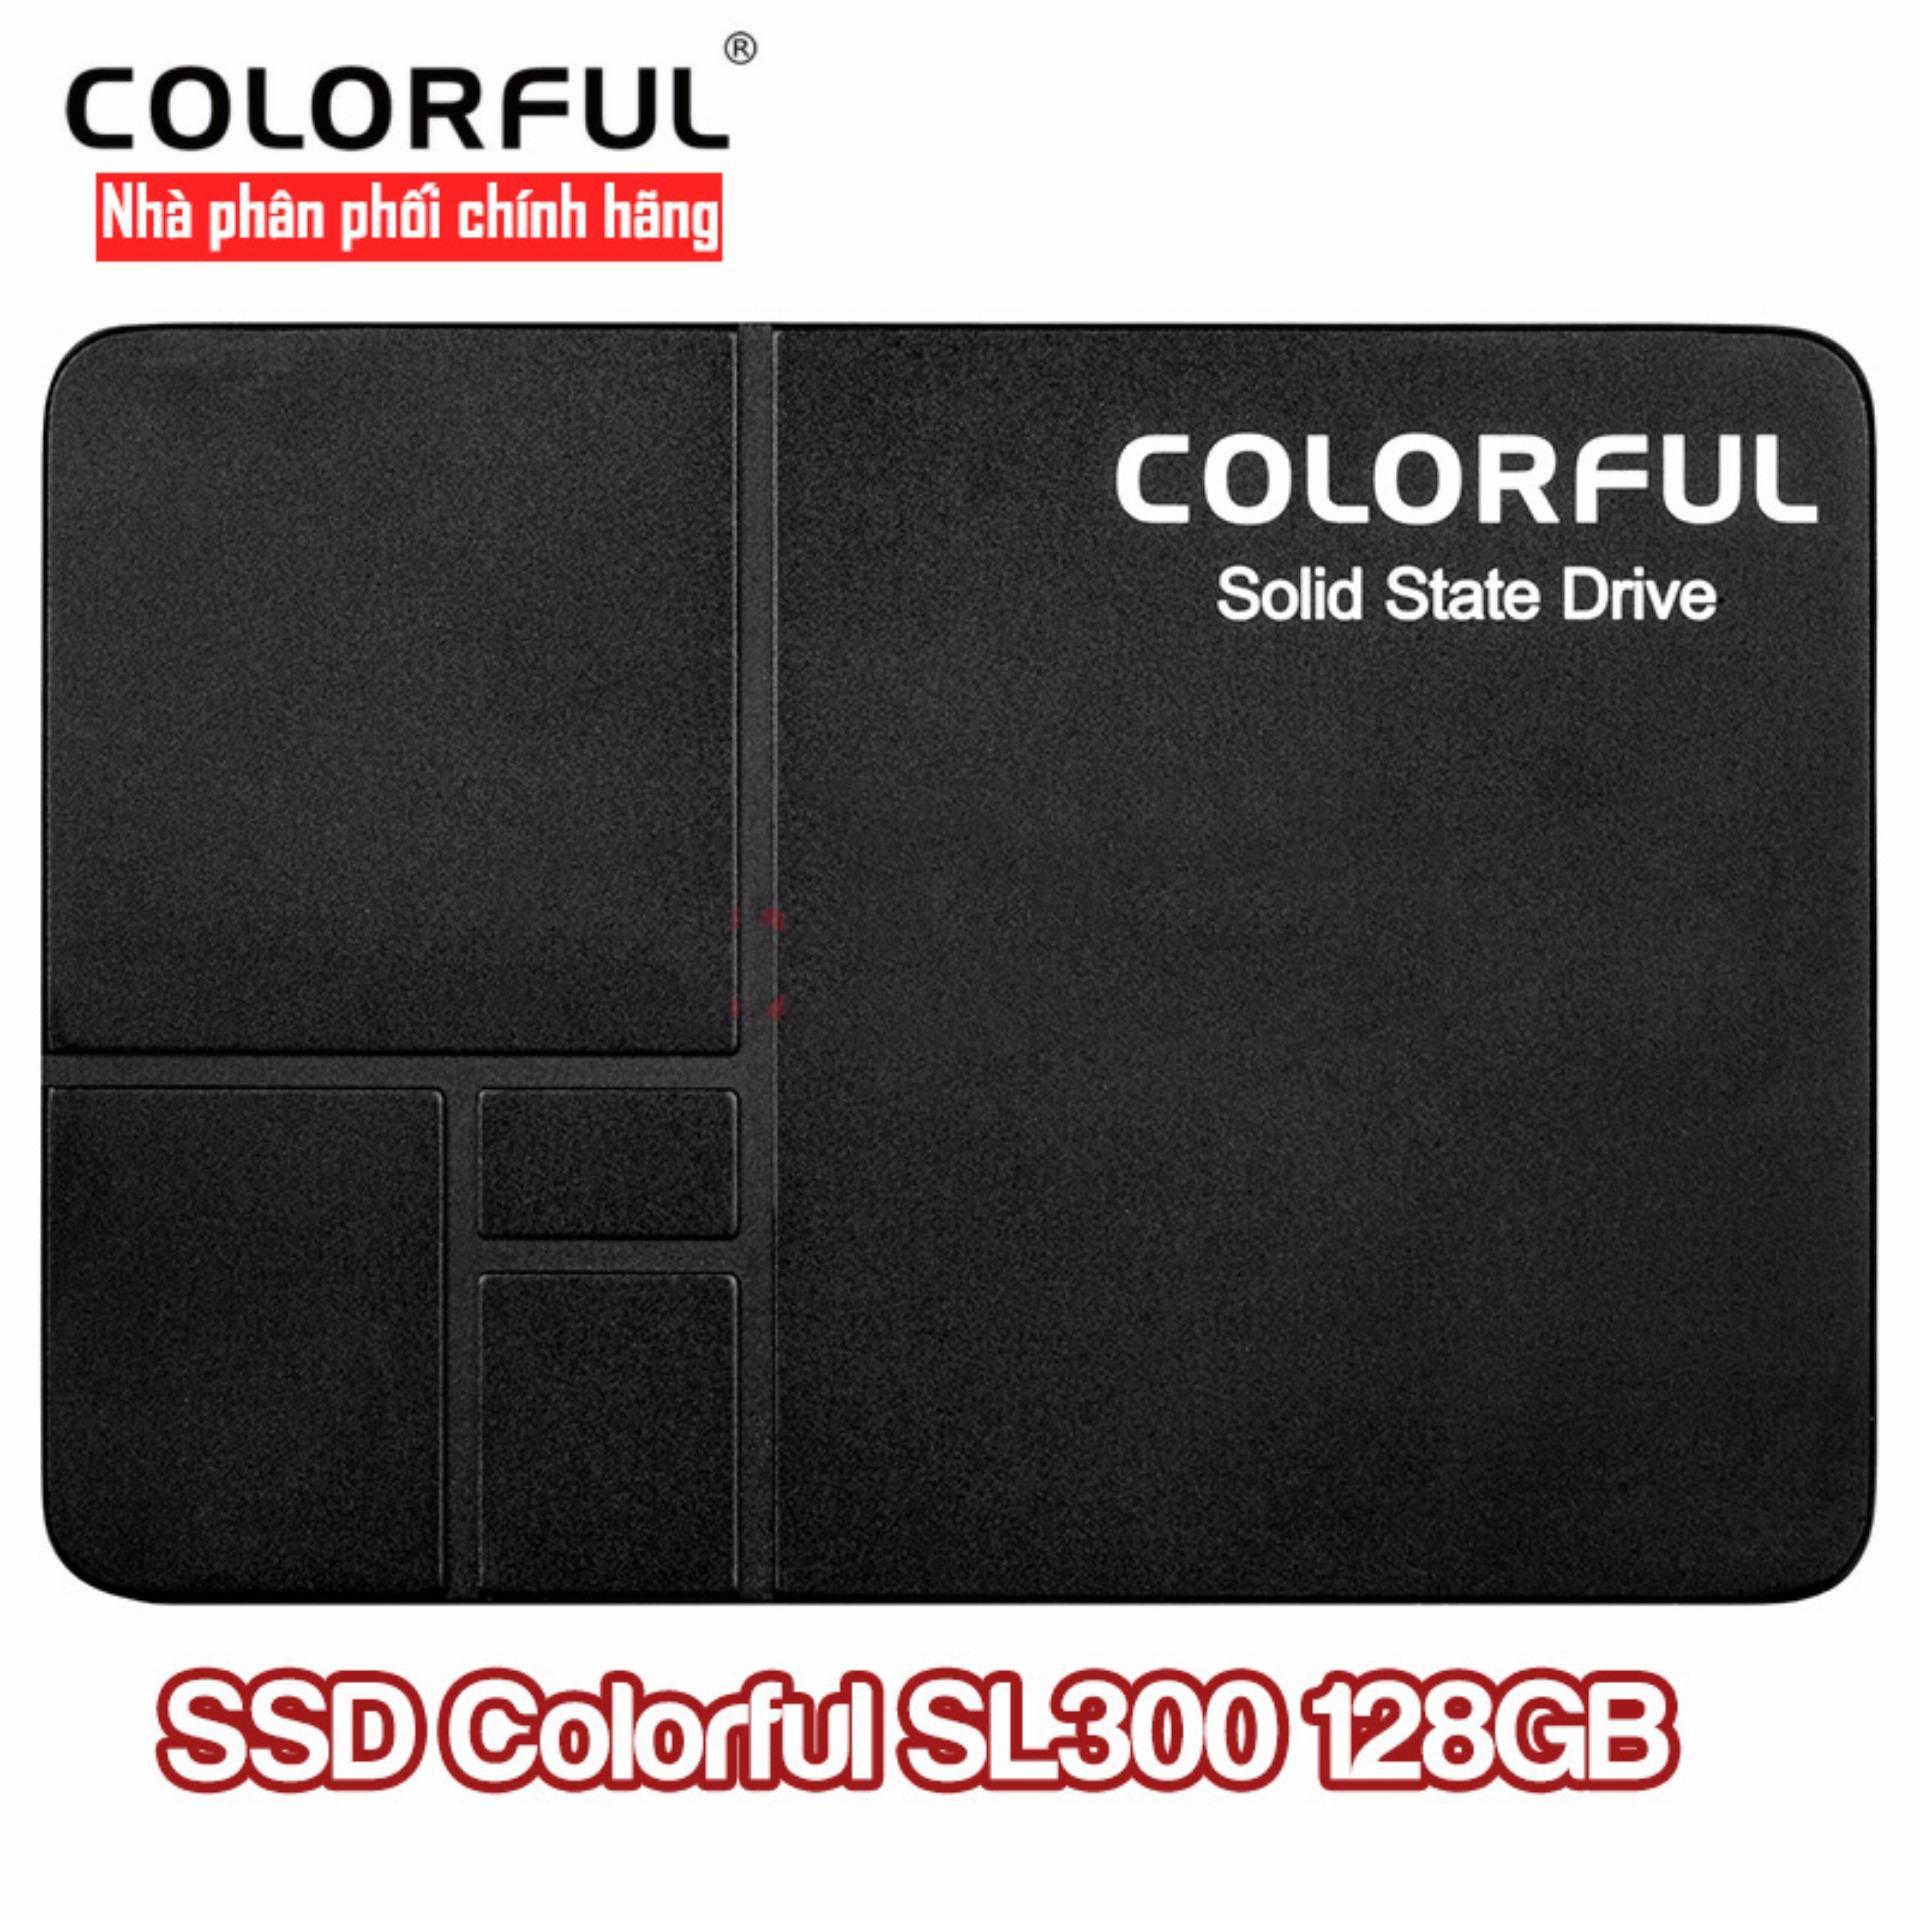 Mua Ổ cứng SSD Colorful SL300 128Gb Tại HolaHola (Tp.HCM)